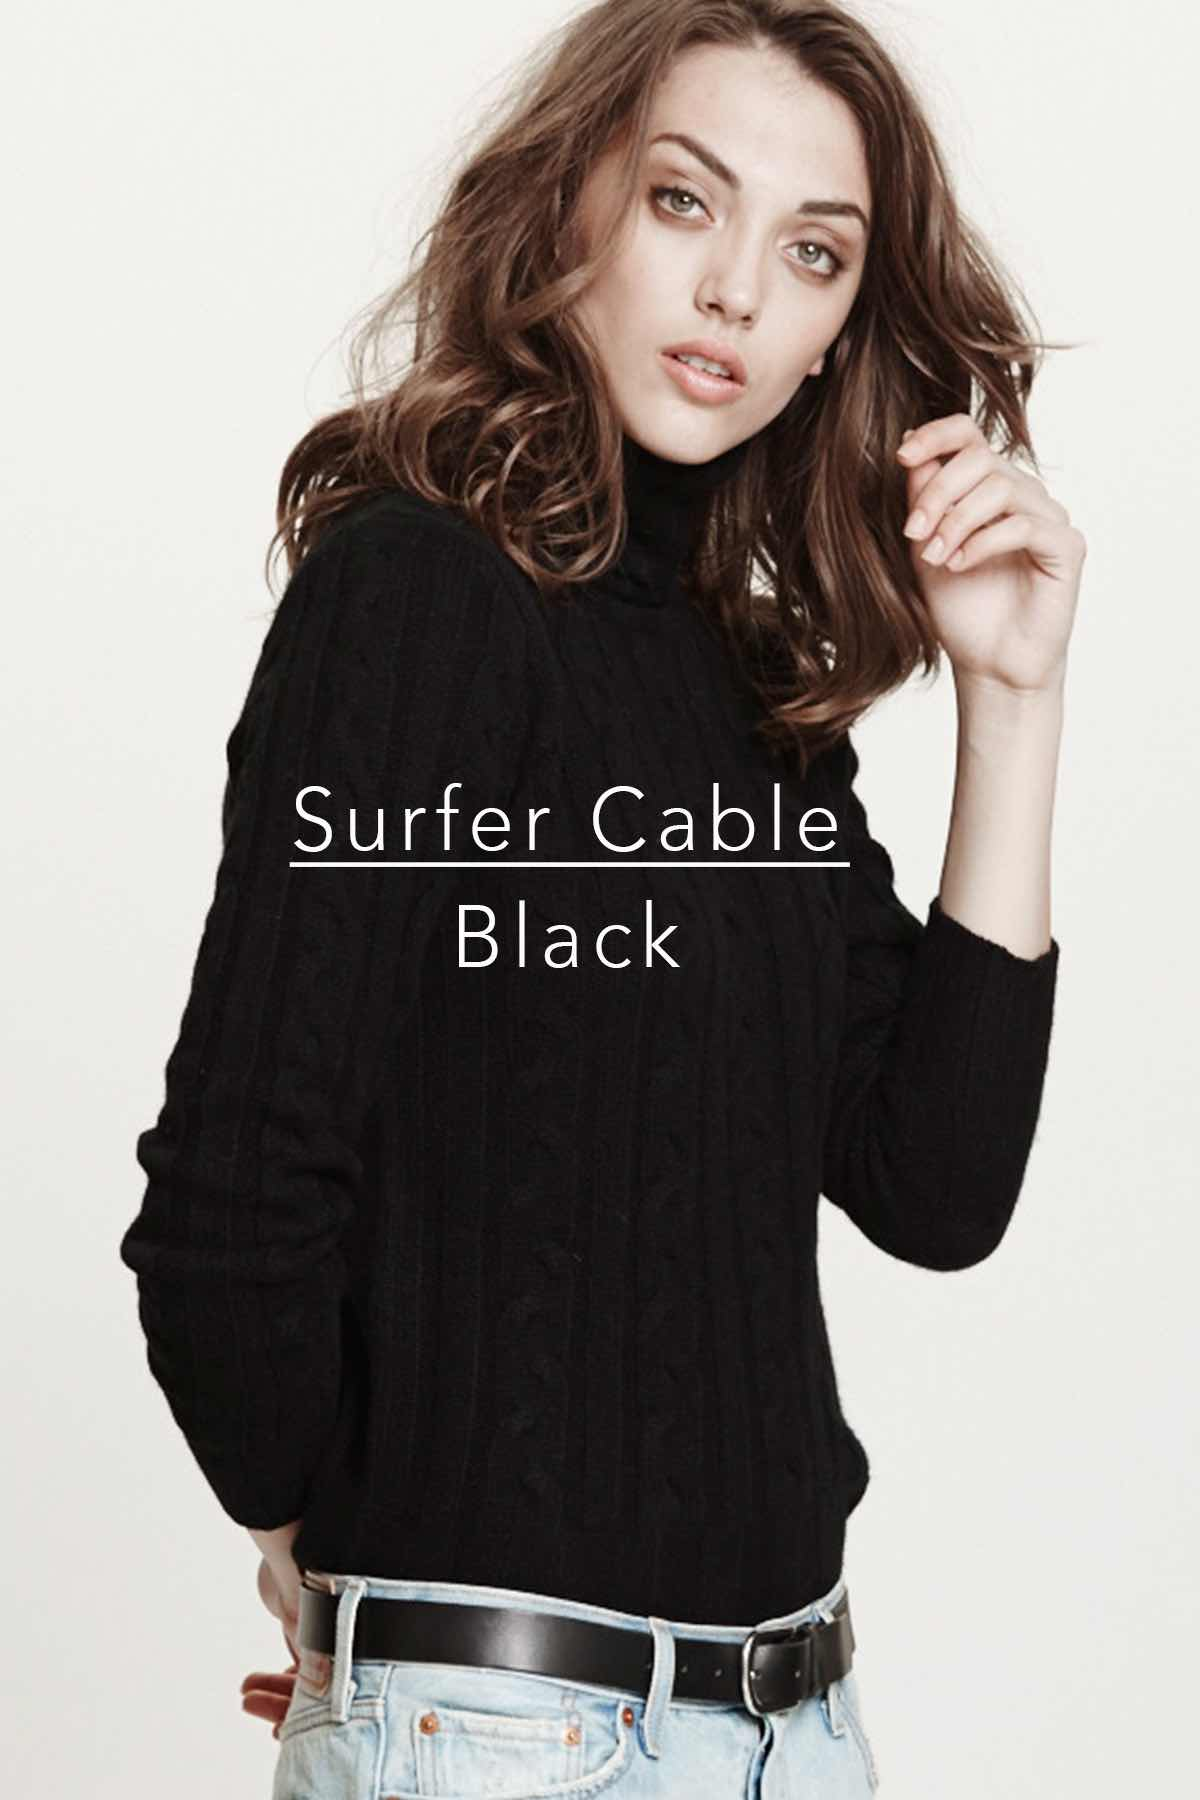 Surfer Cable Black